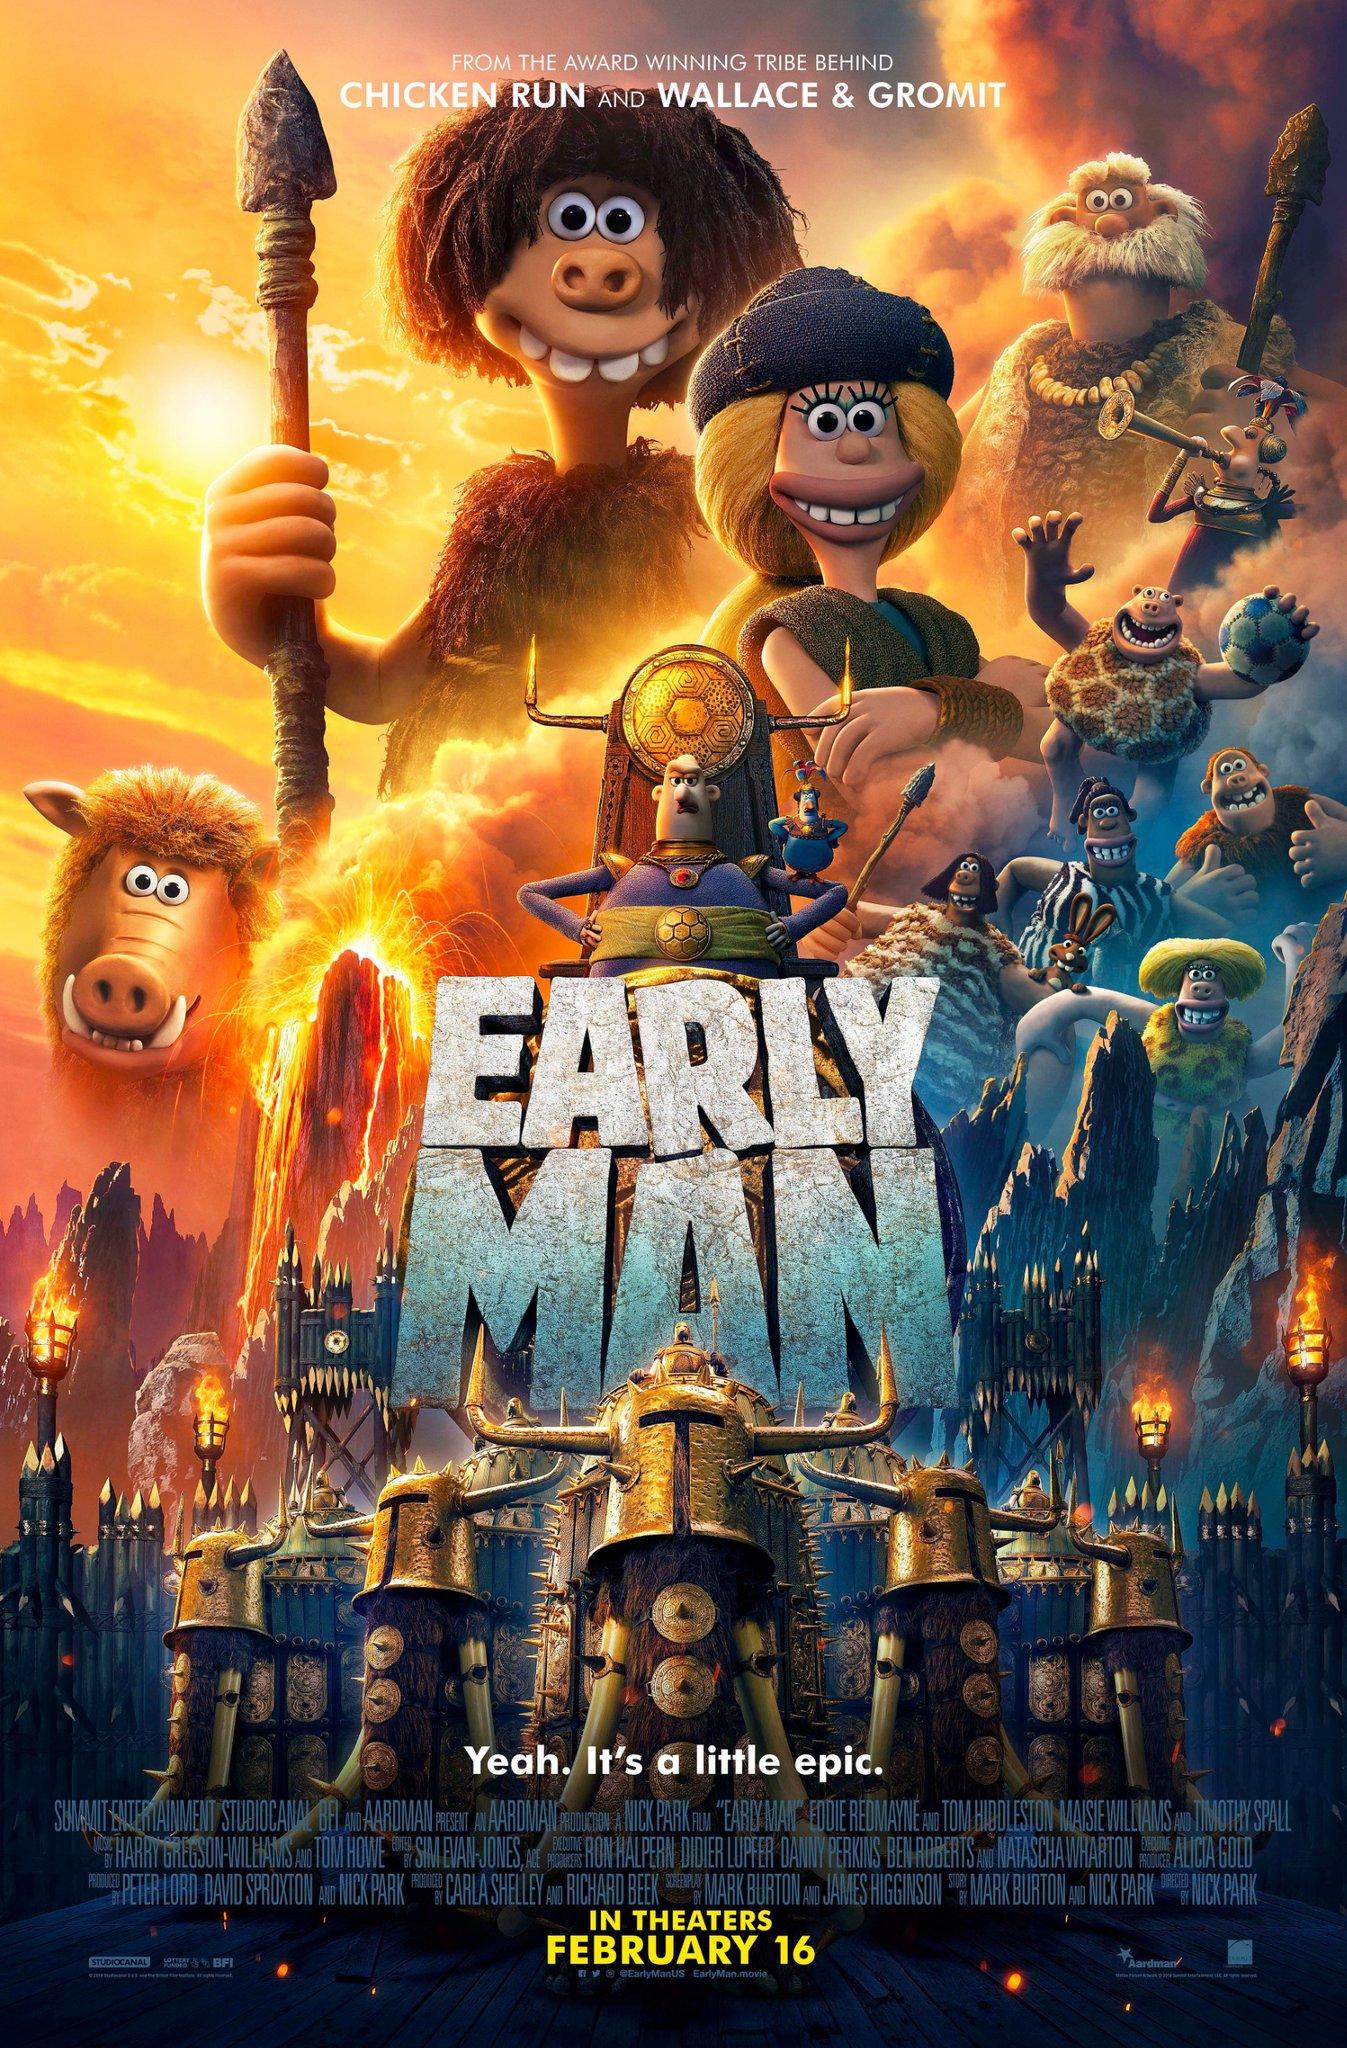 Early-Man-Its-a-little-epic.jpg